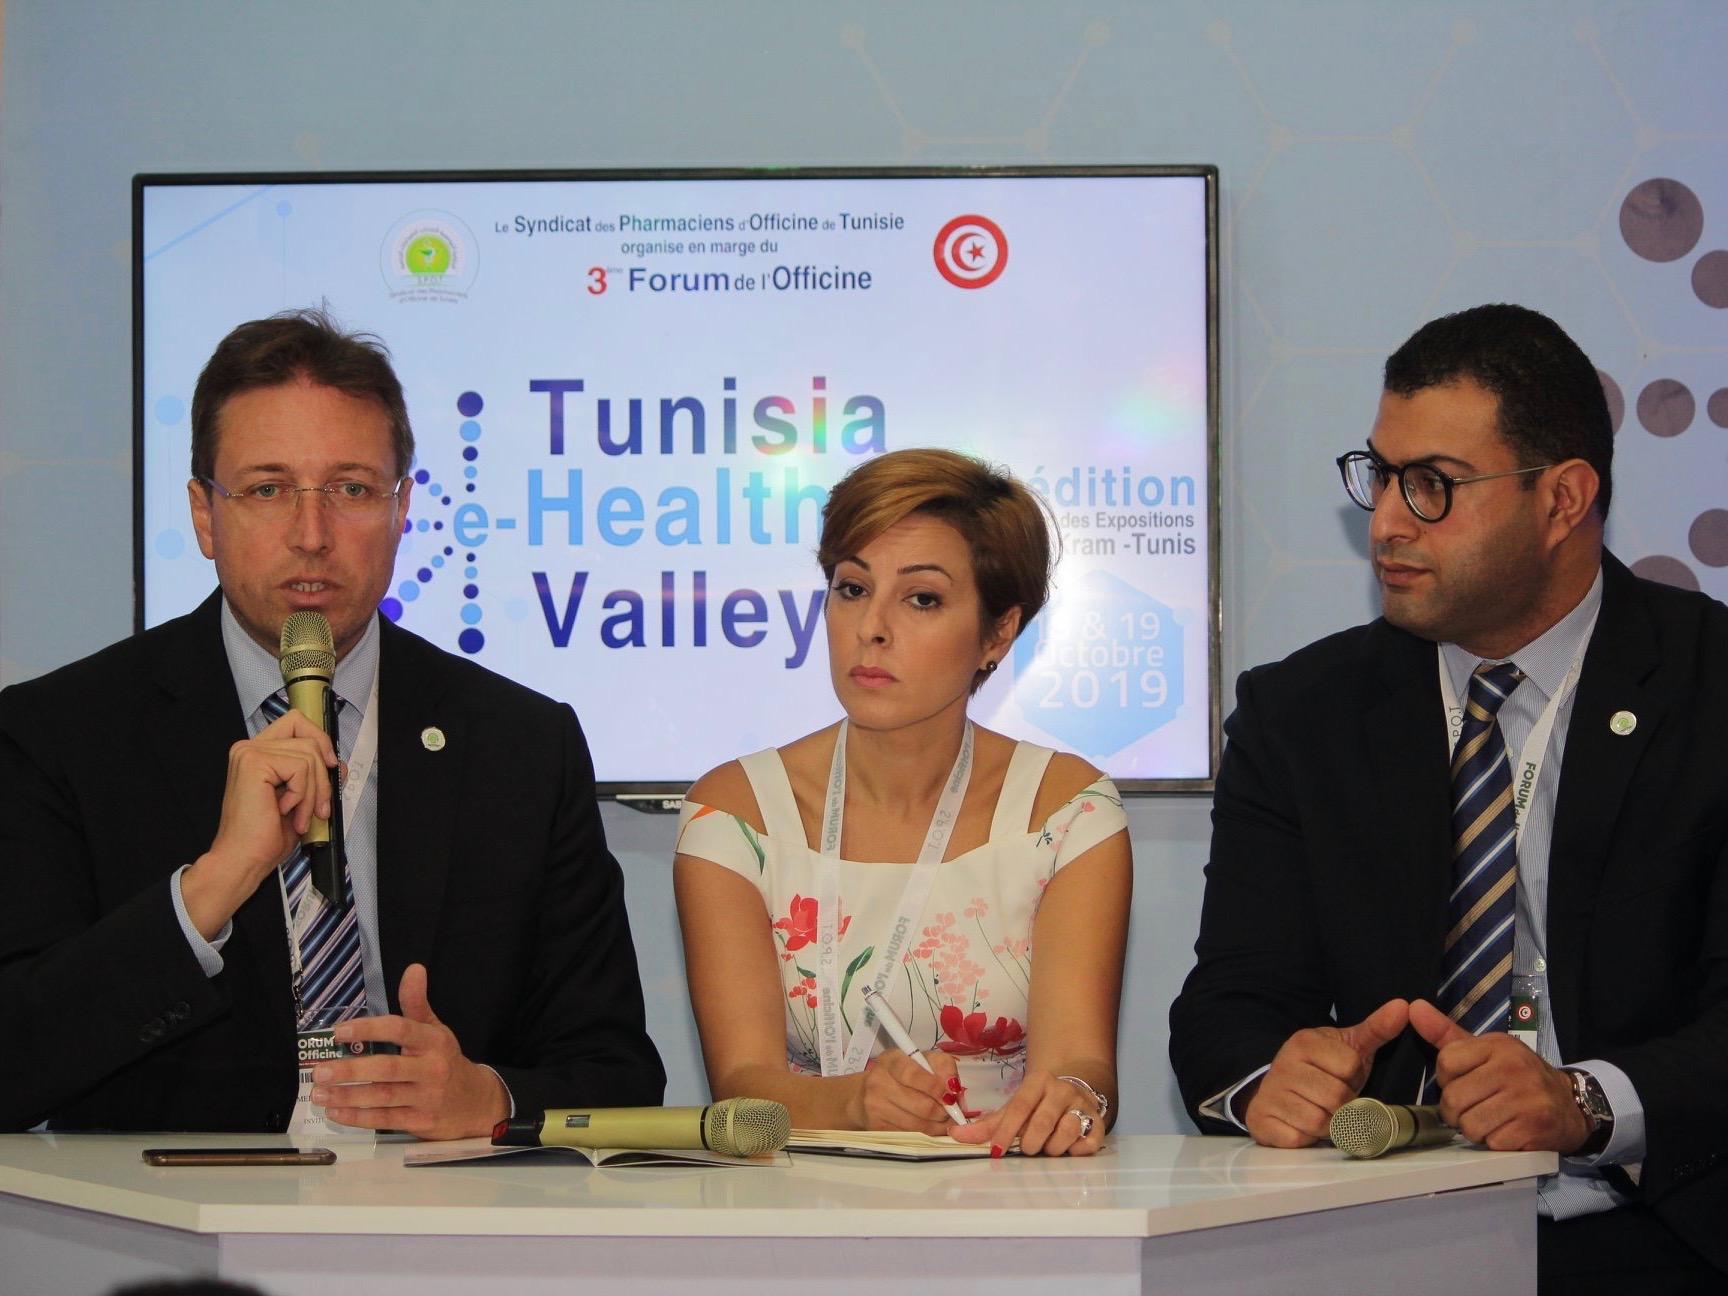 Tunisia e-Health Valley 2019 Dr Ahmed SKHIRI - 1